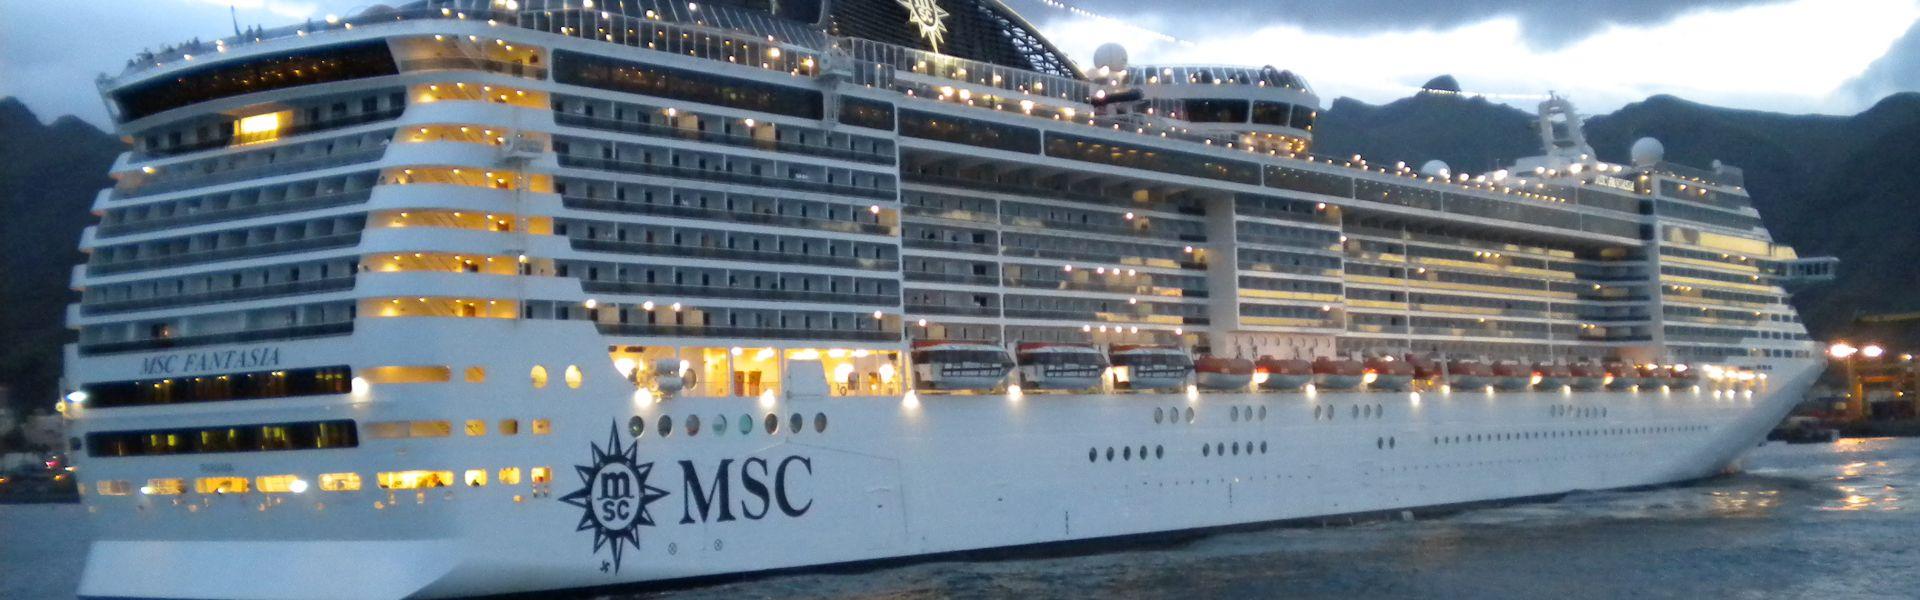 Croaziera Grup Organizat 2017 cu ZBOR INCLUS - Insulele Canare & Maroc (Genova) - MSC Cruises - MSC Fantasia - 12 nopti